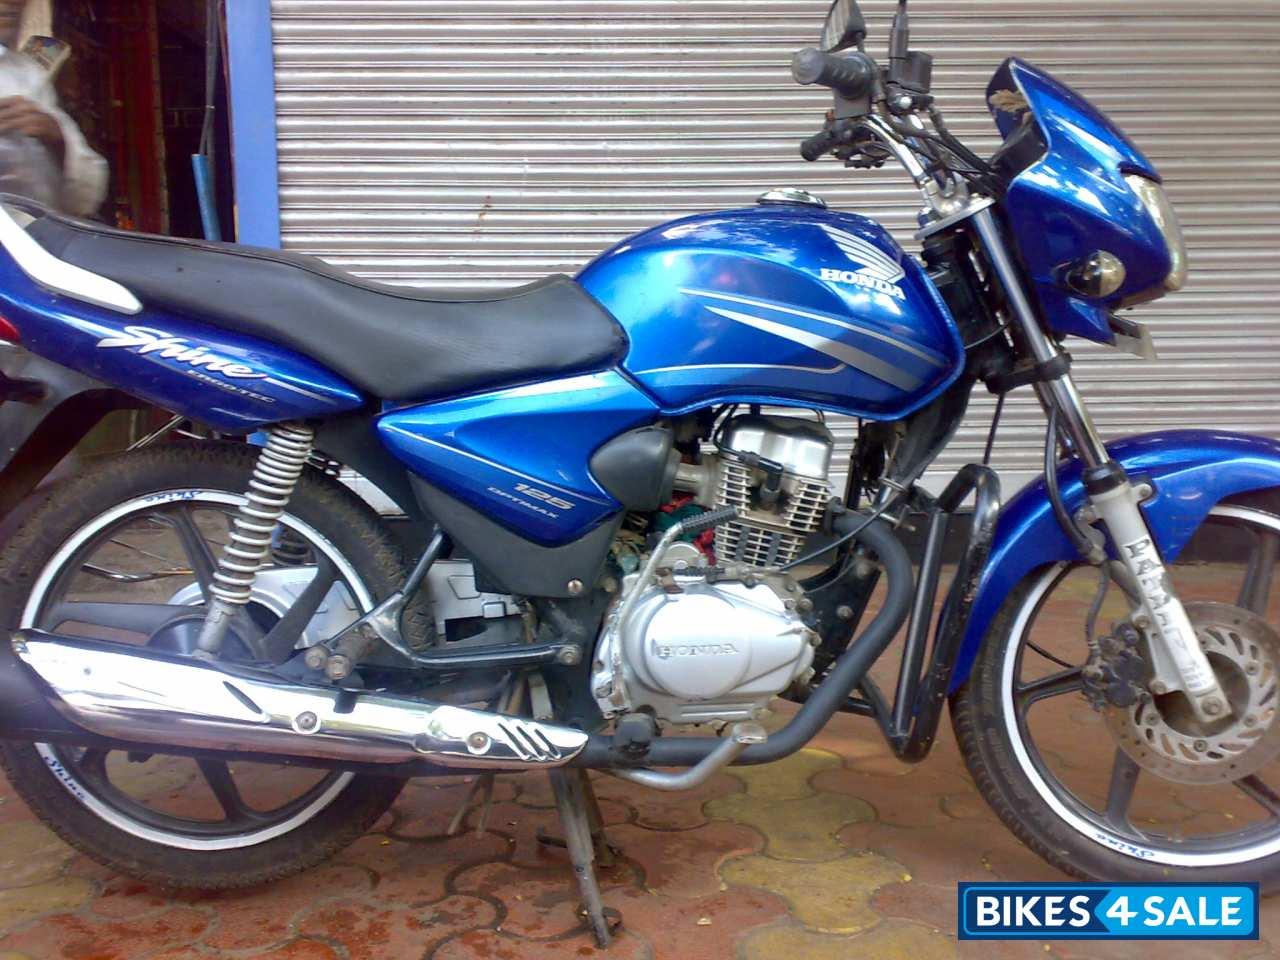 Honda Shine New Price In Mumbai Honda Cb Shine Cc Latest Price In